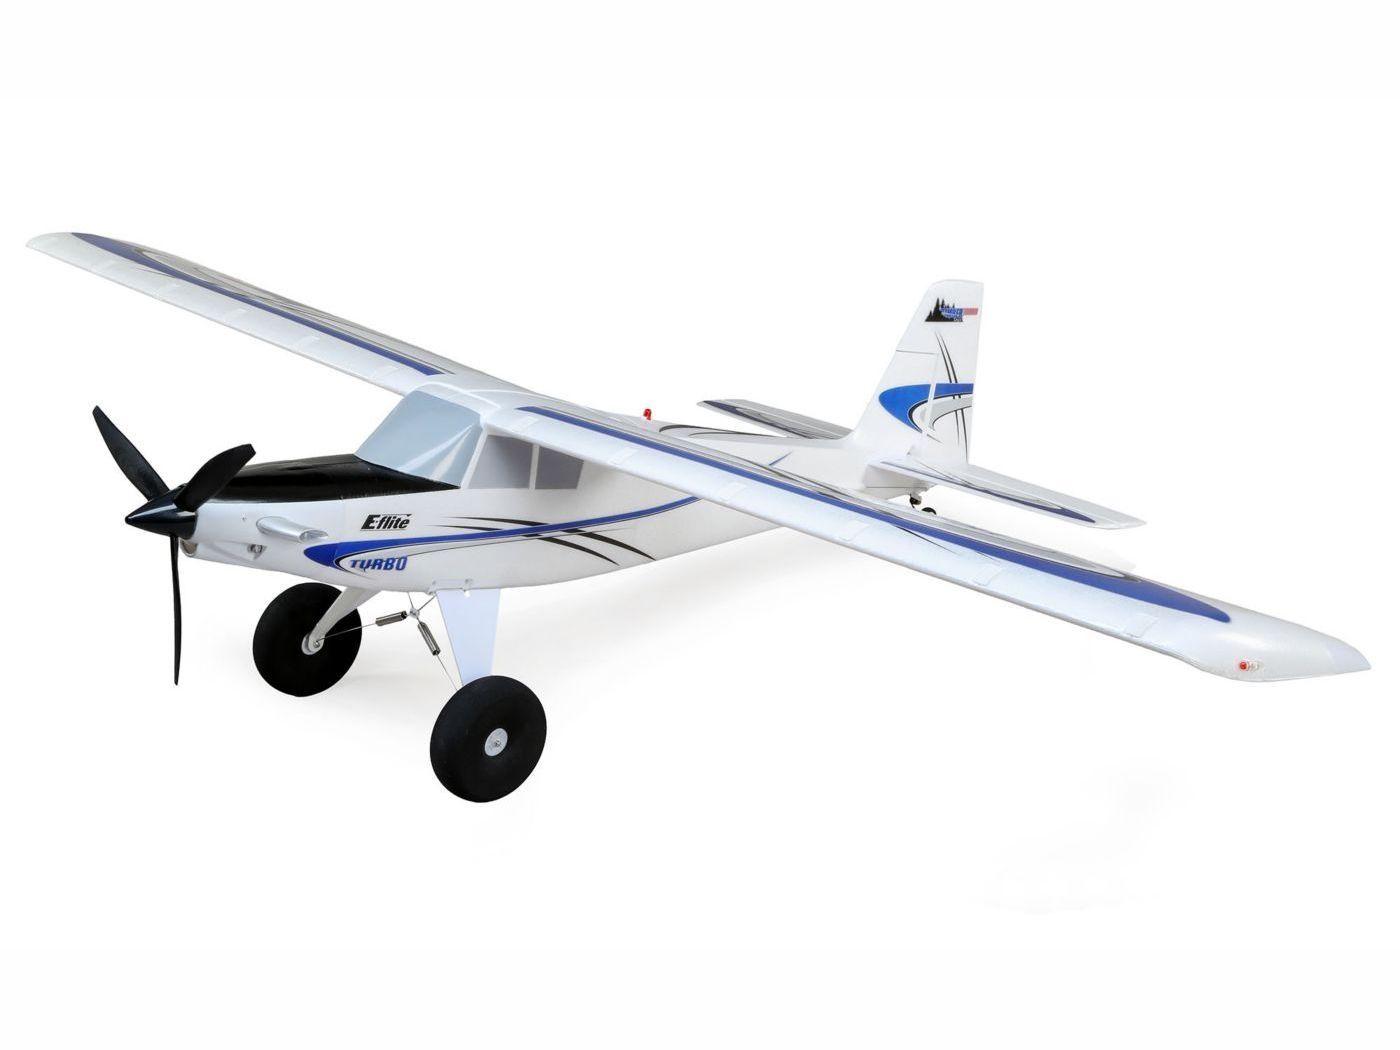 Avion E-flite Turbo Timber 1.5m BNF Basic - EFL15250